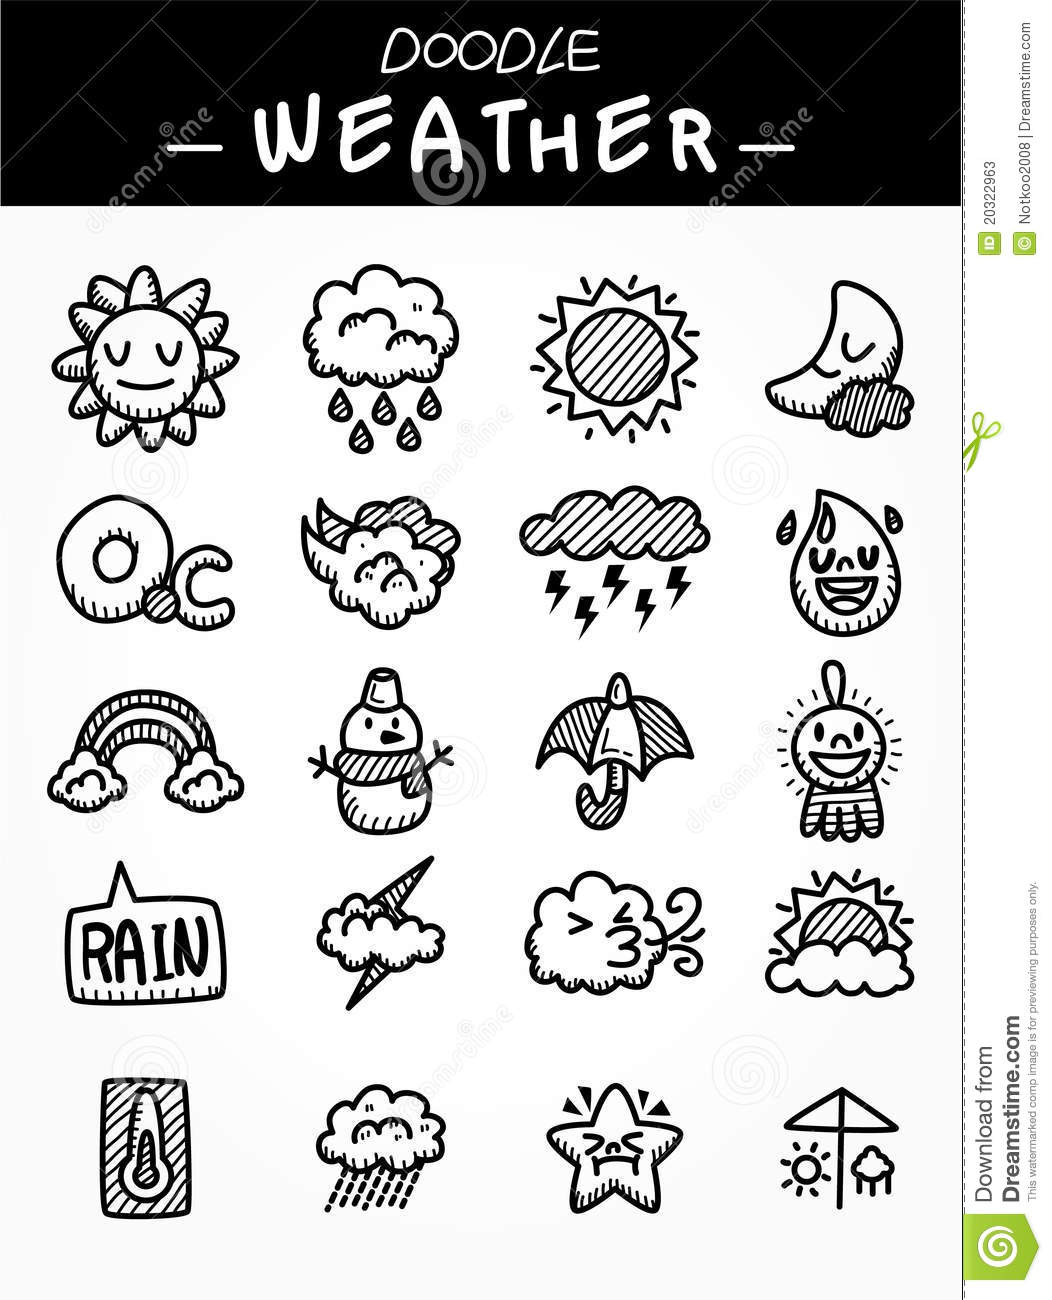 How to Draw Cartoon Weather